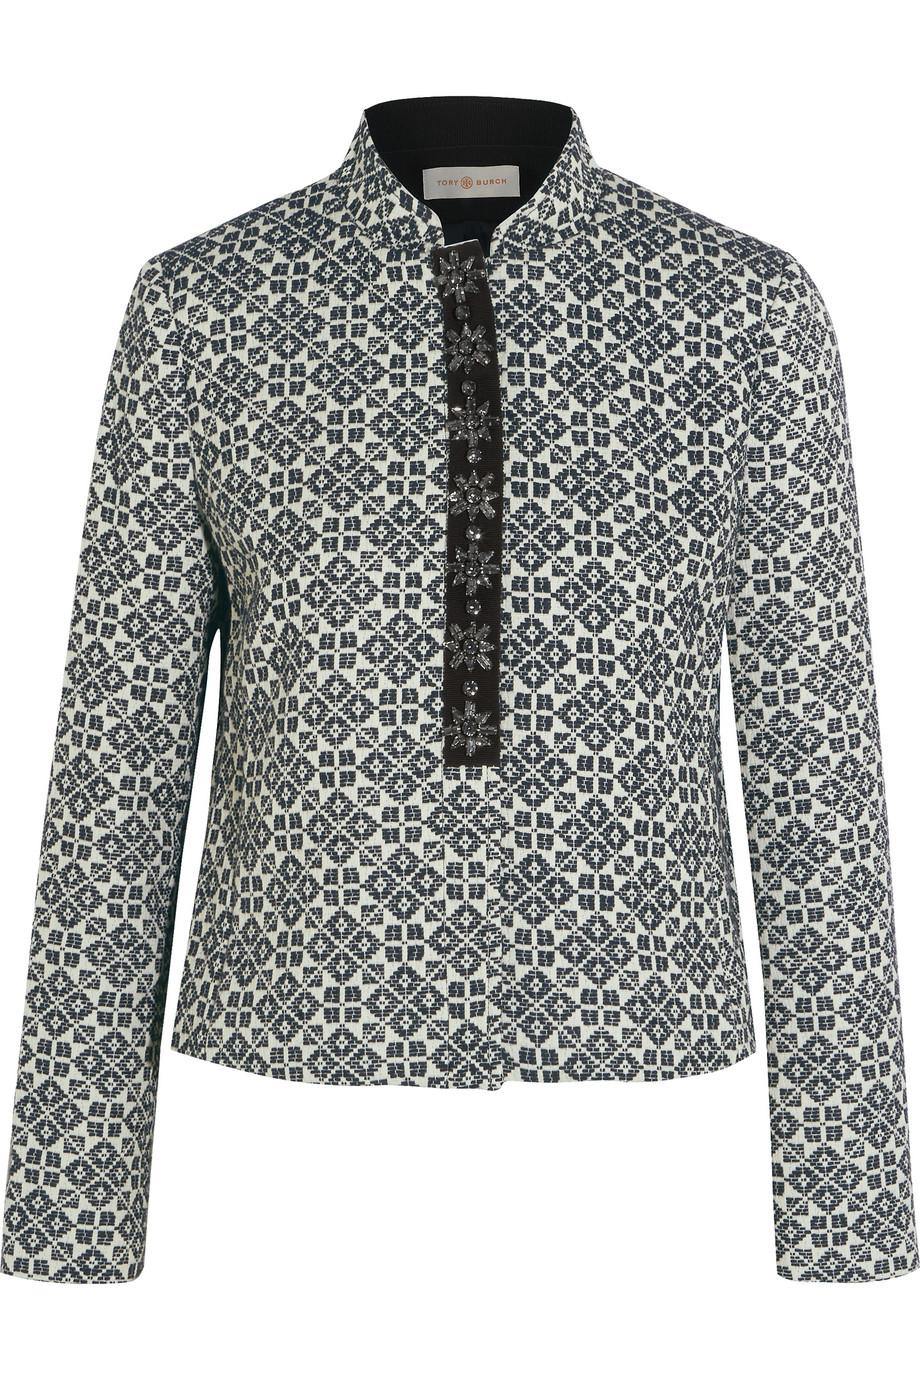 Tory Burch Embellished Cotton-Blend Jacquard Jacket, Midnight Blue, Women's, Size: 14